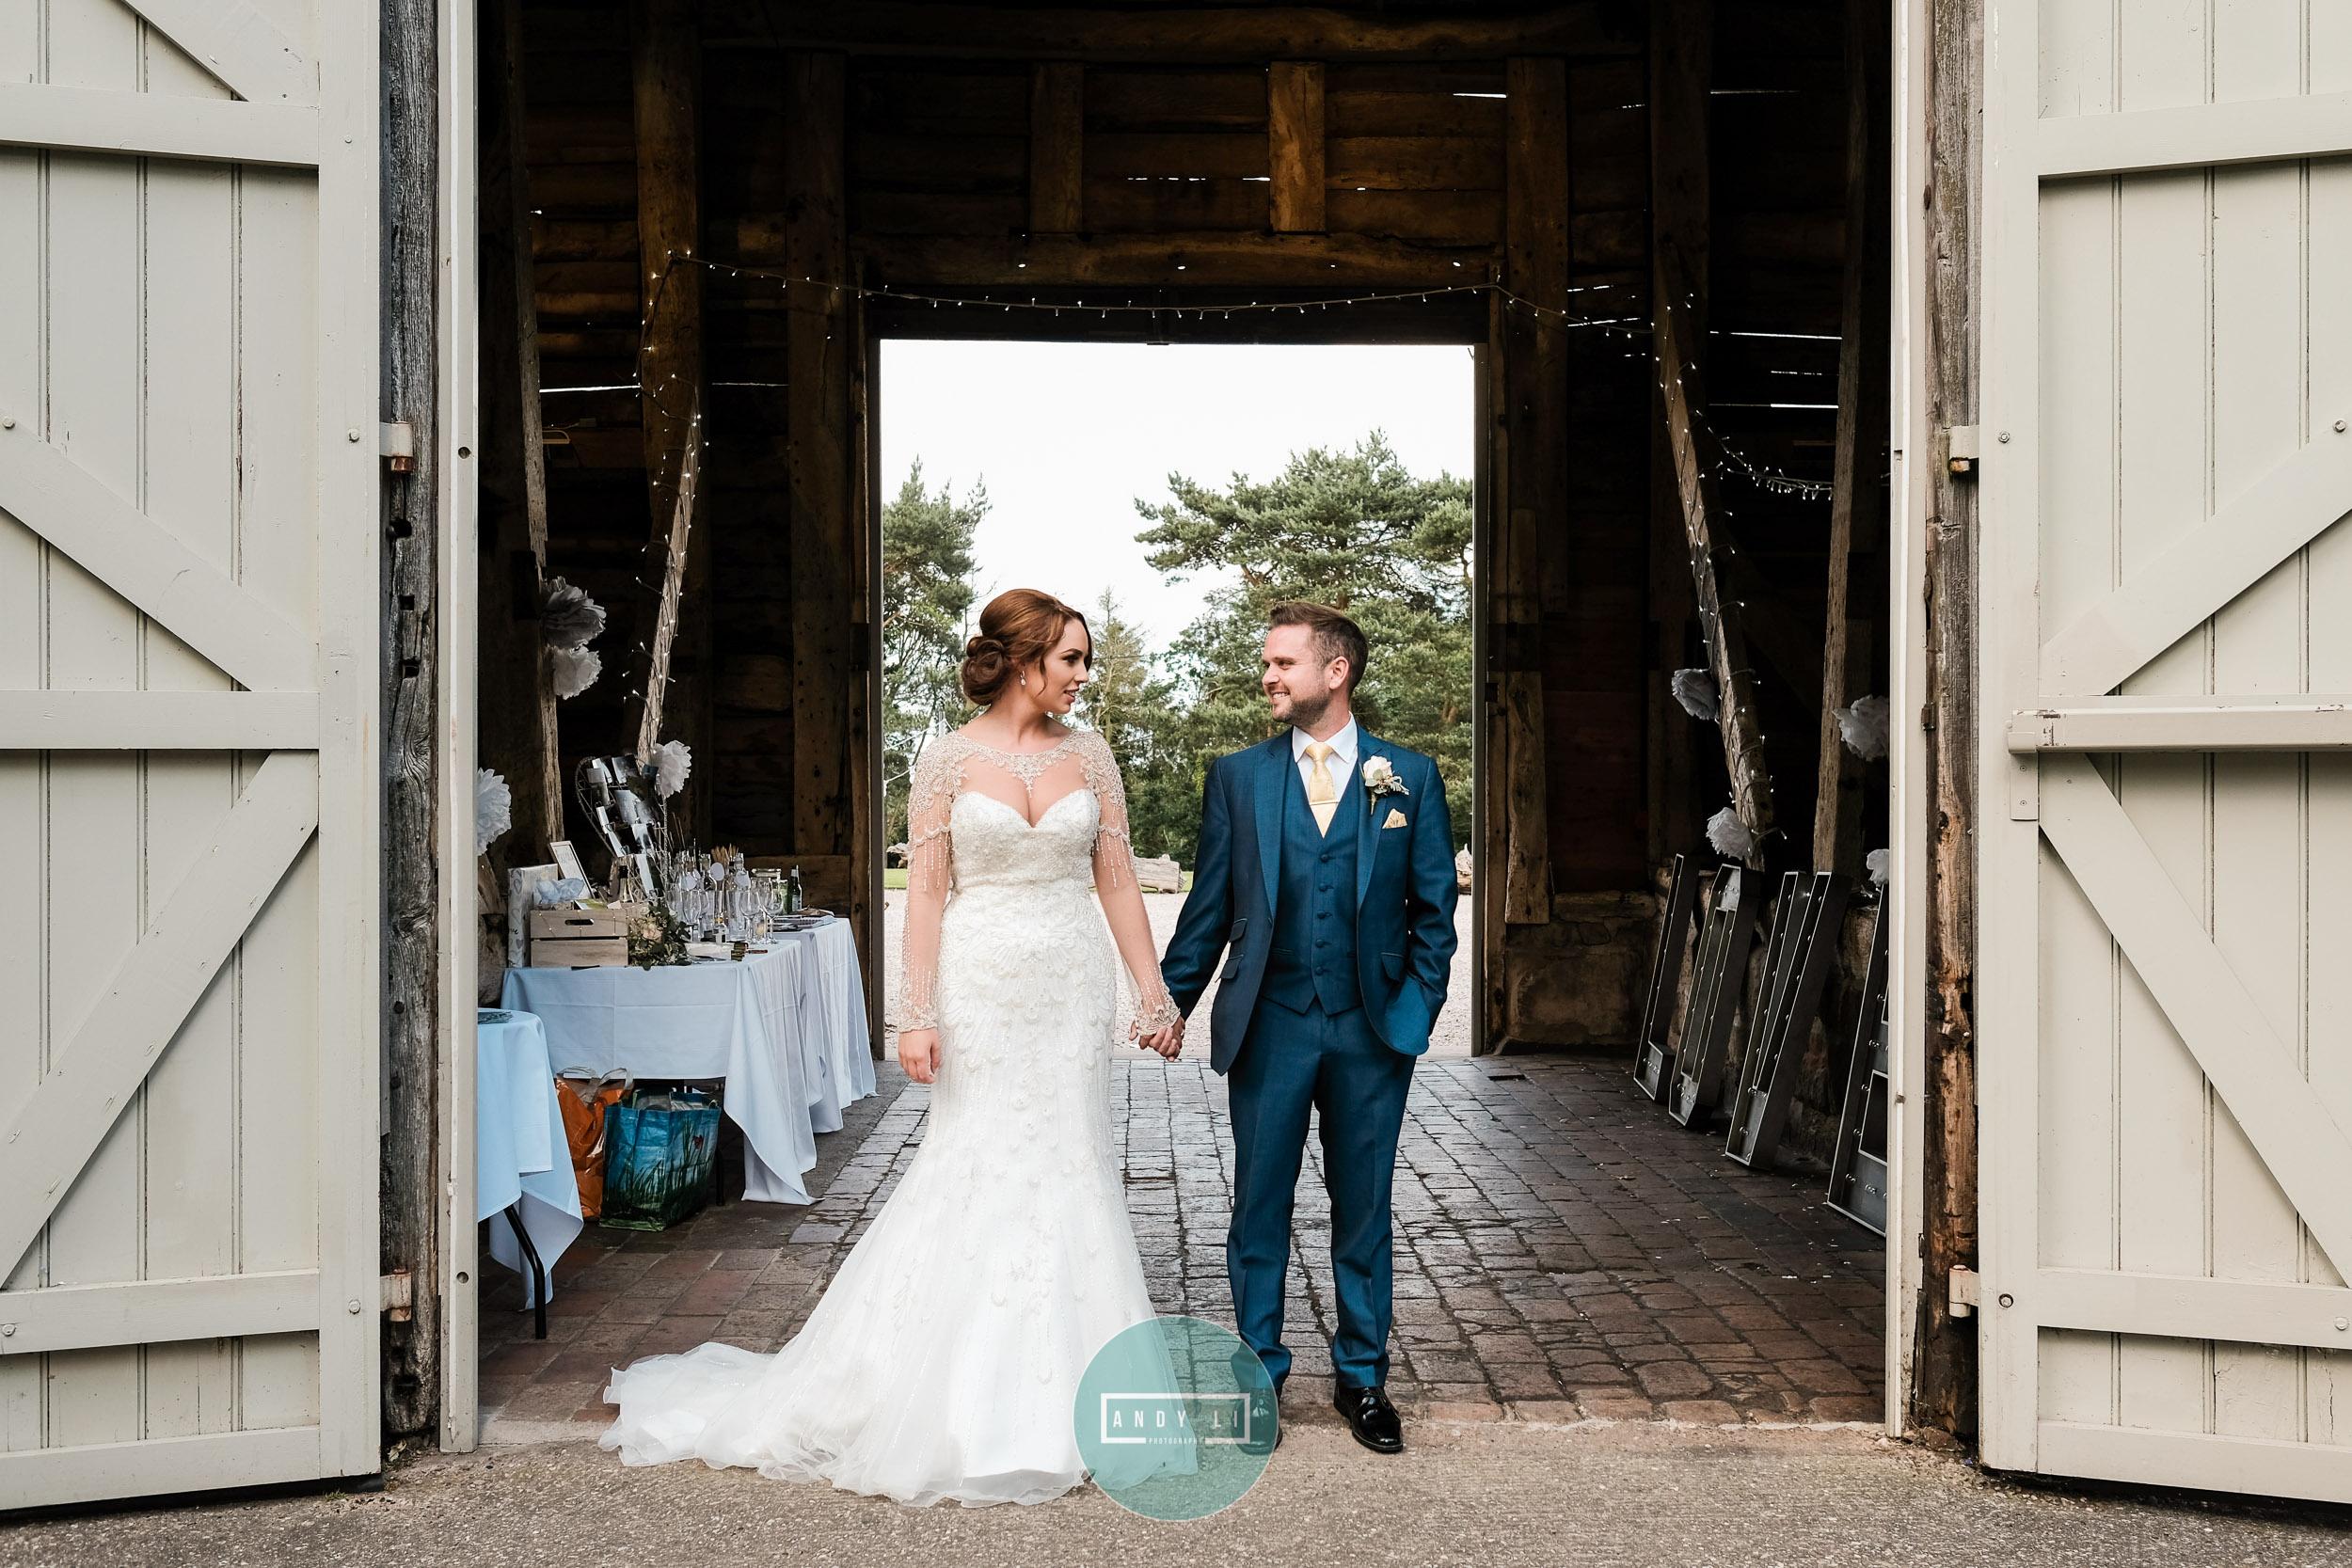 Pimhill Barn Wedding Photographer-099-DSCF0670.jpg